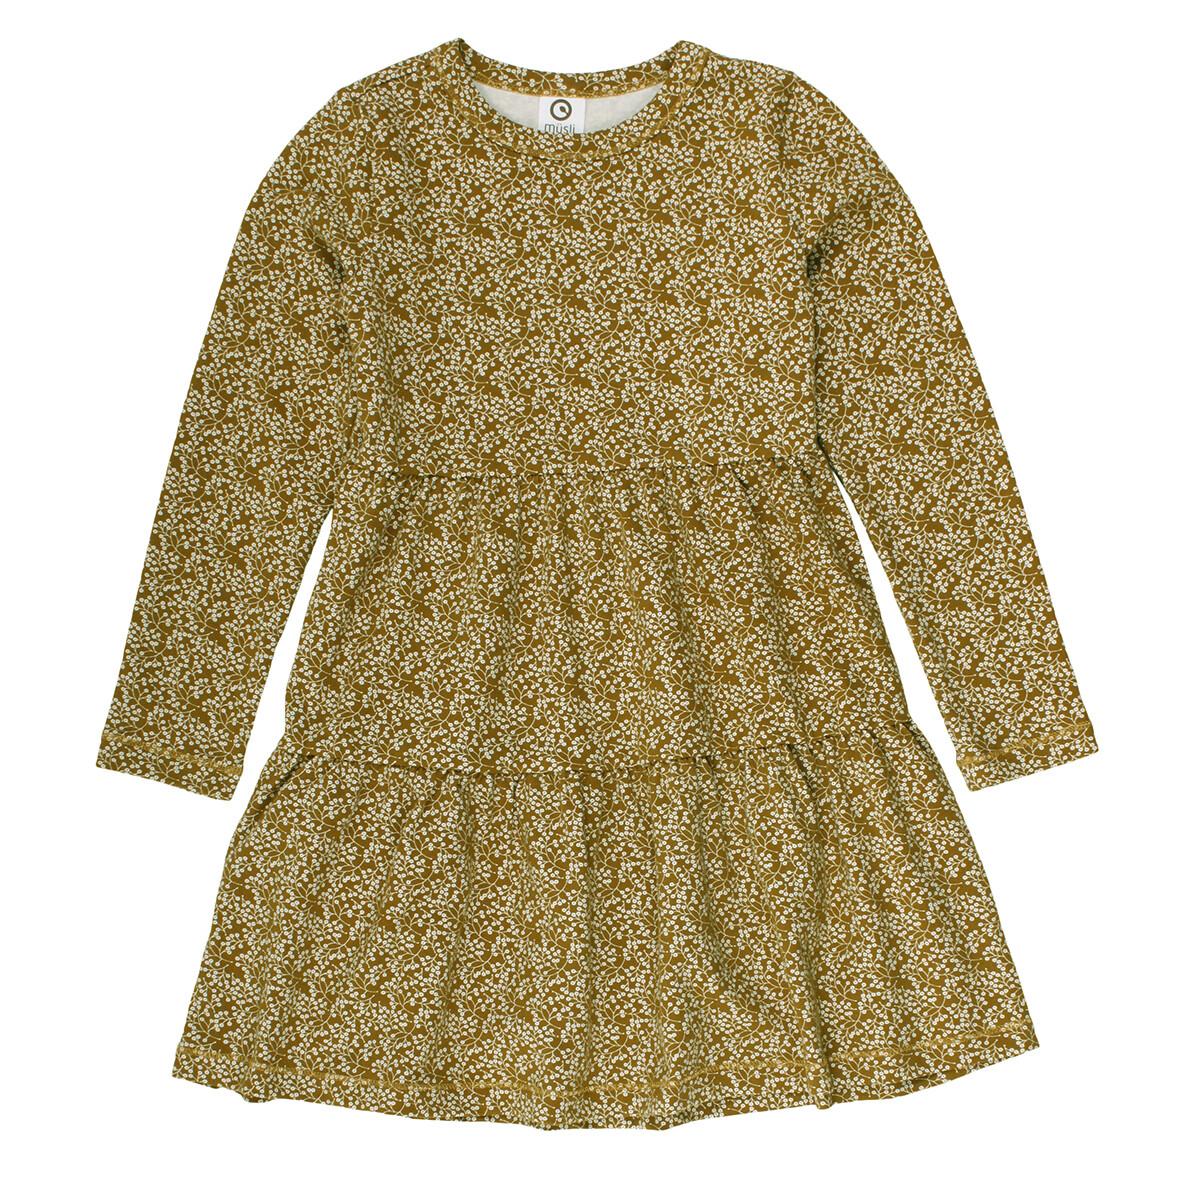 Musli Girls Pesto Petit Fleur Dress